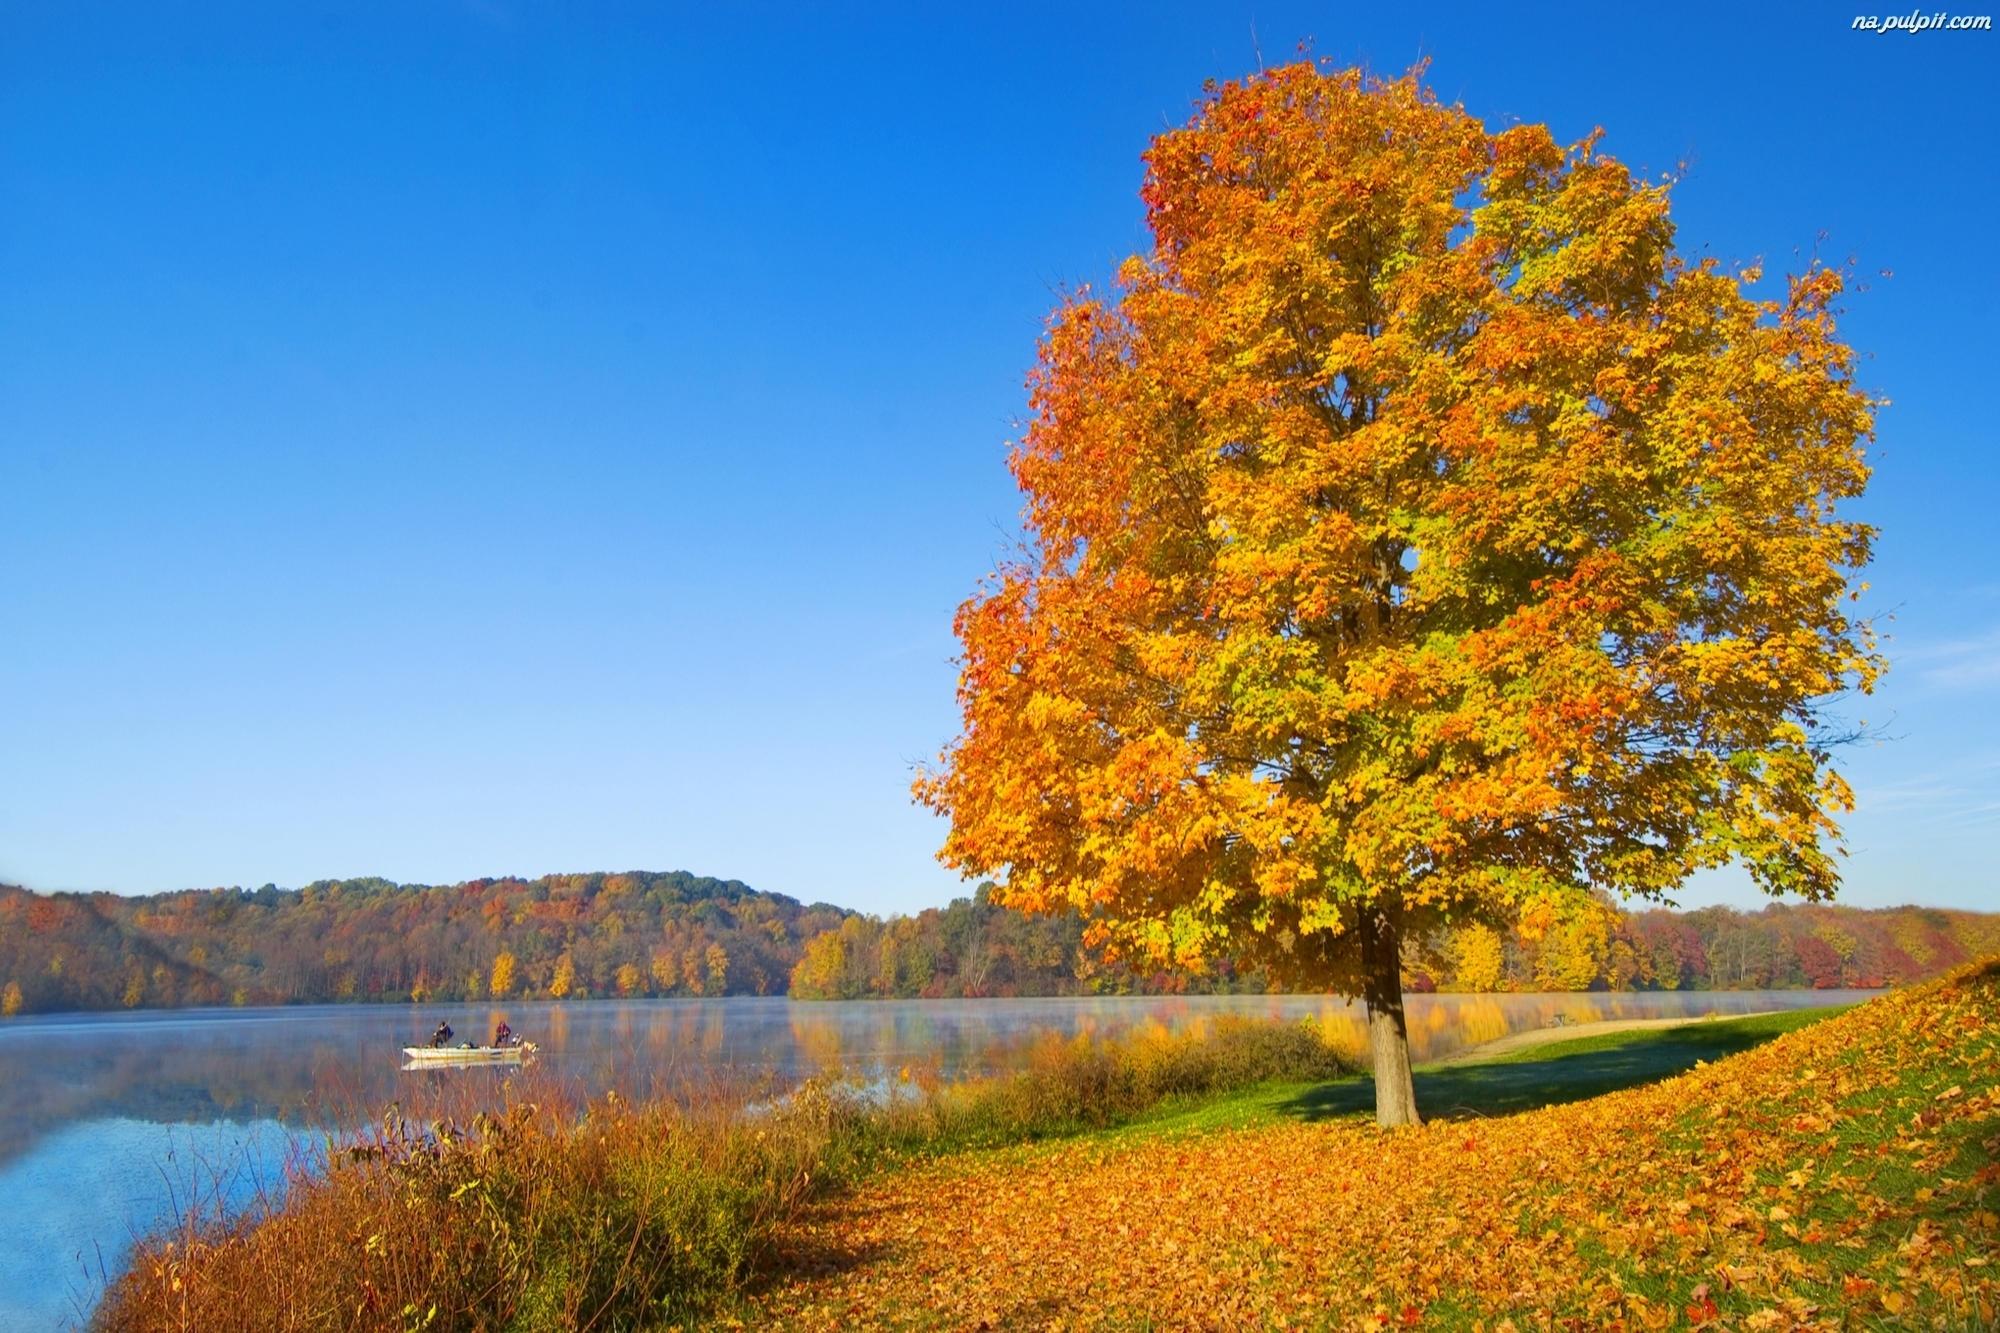 Li cie drzewo jesie jezioro na pulpit for Wallpaper hd paesaggi